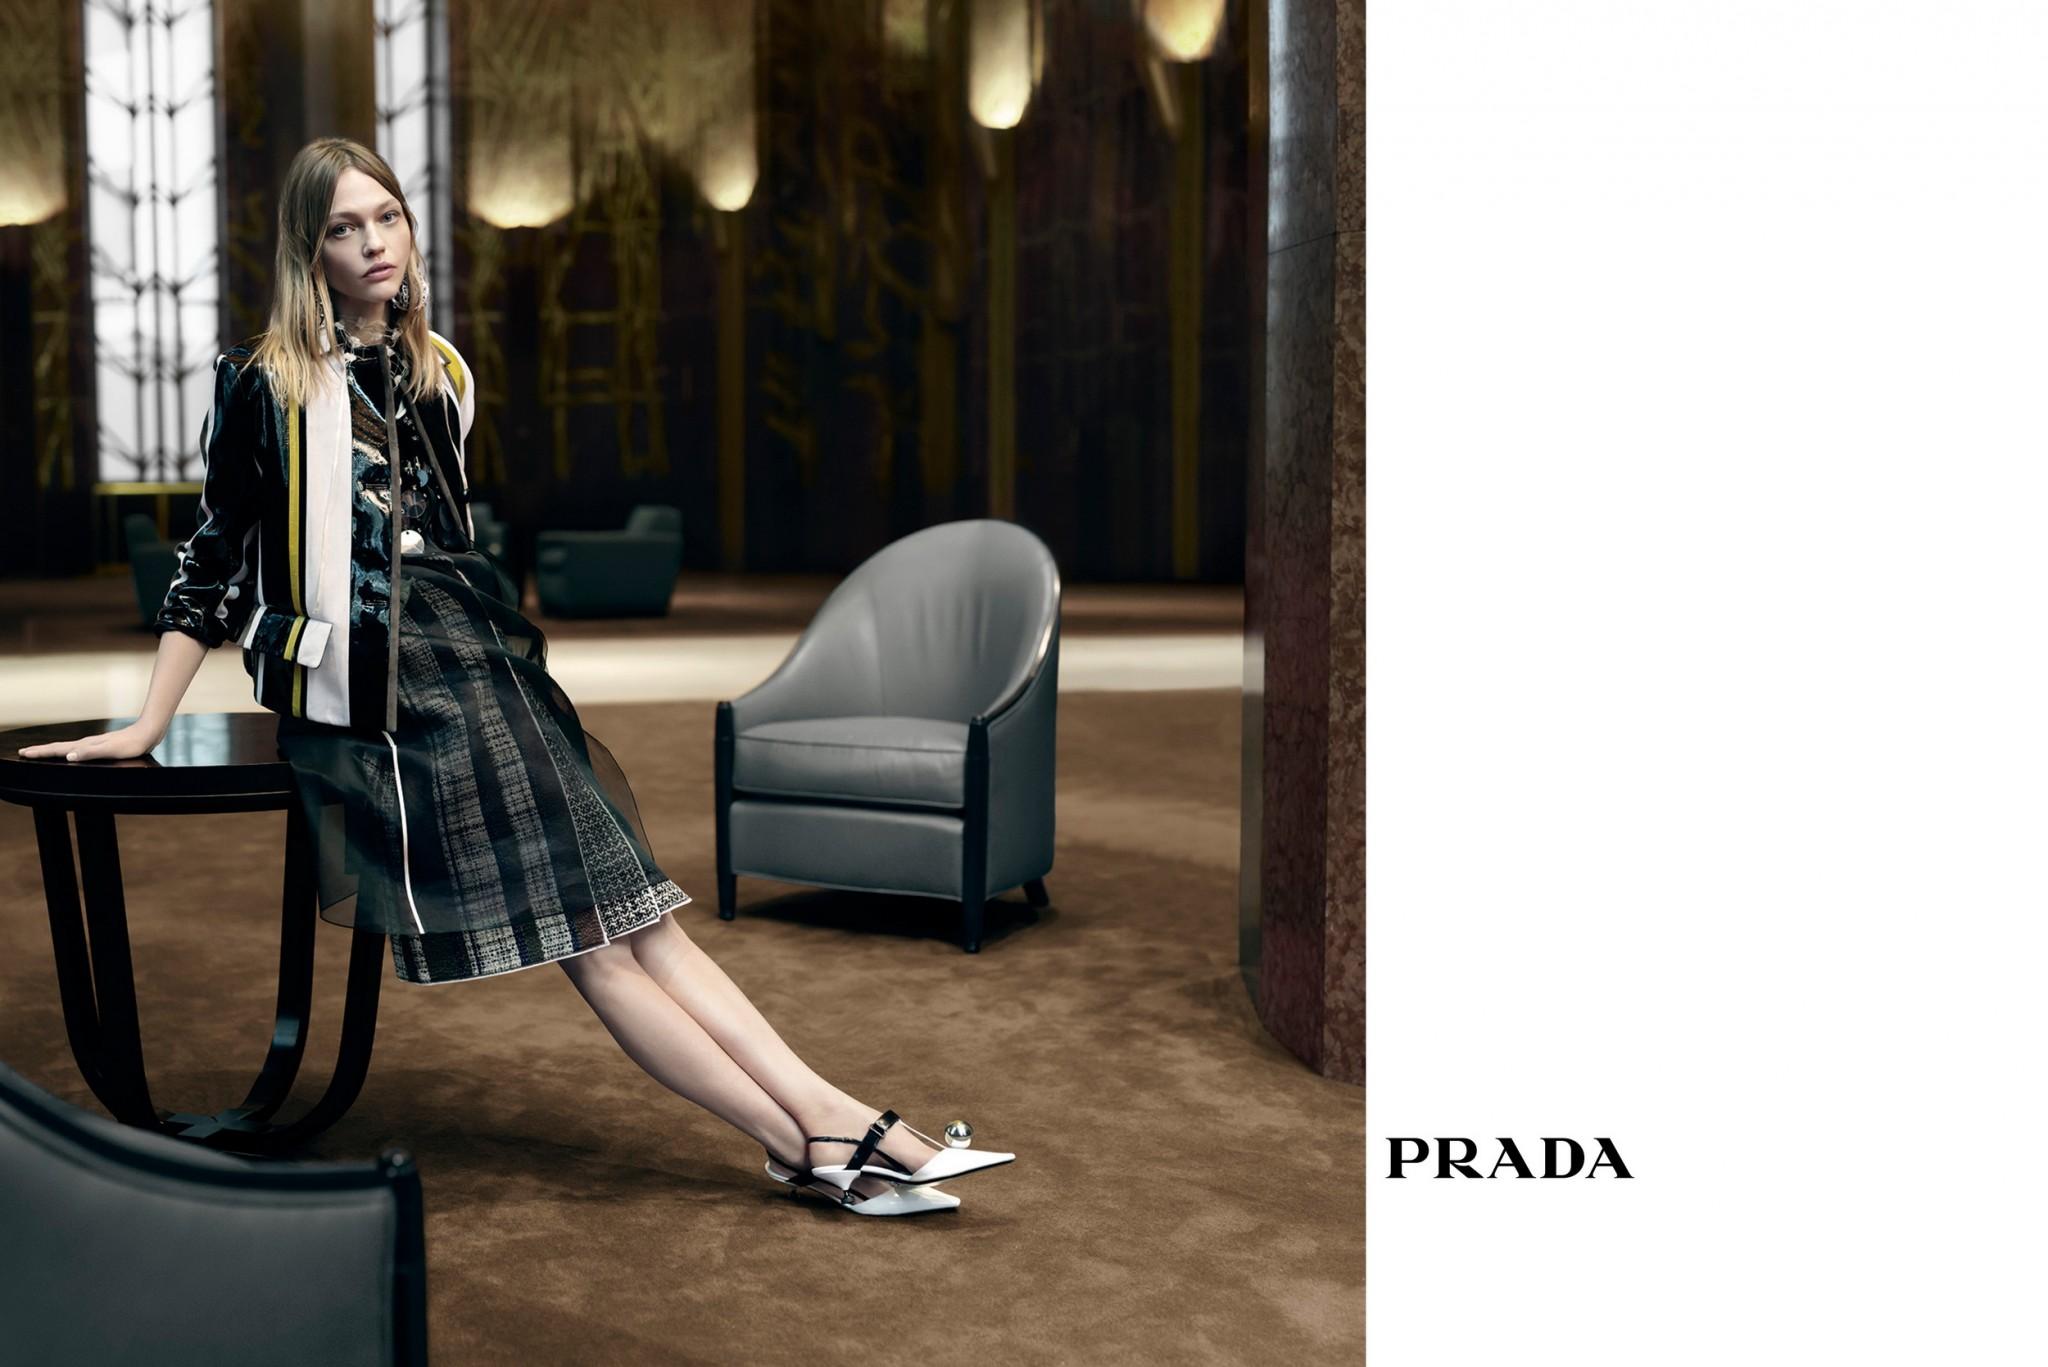 Prada release SS16 ad campaign – The Glass Magazine